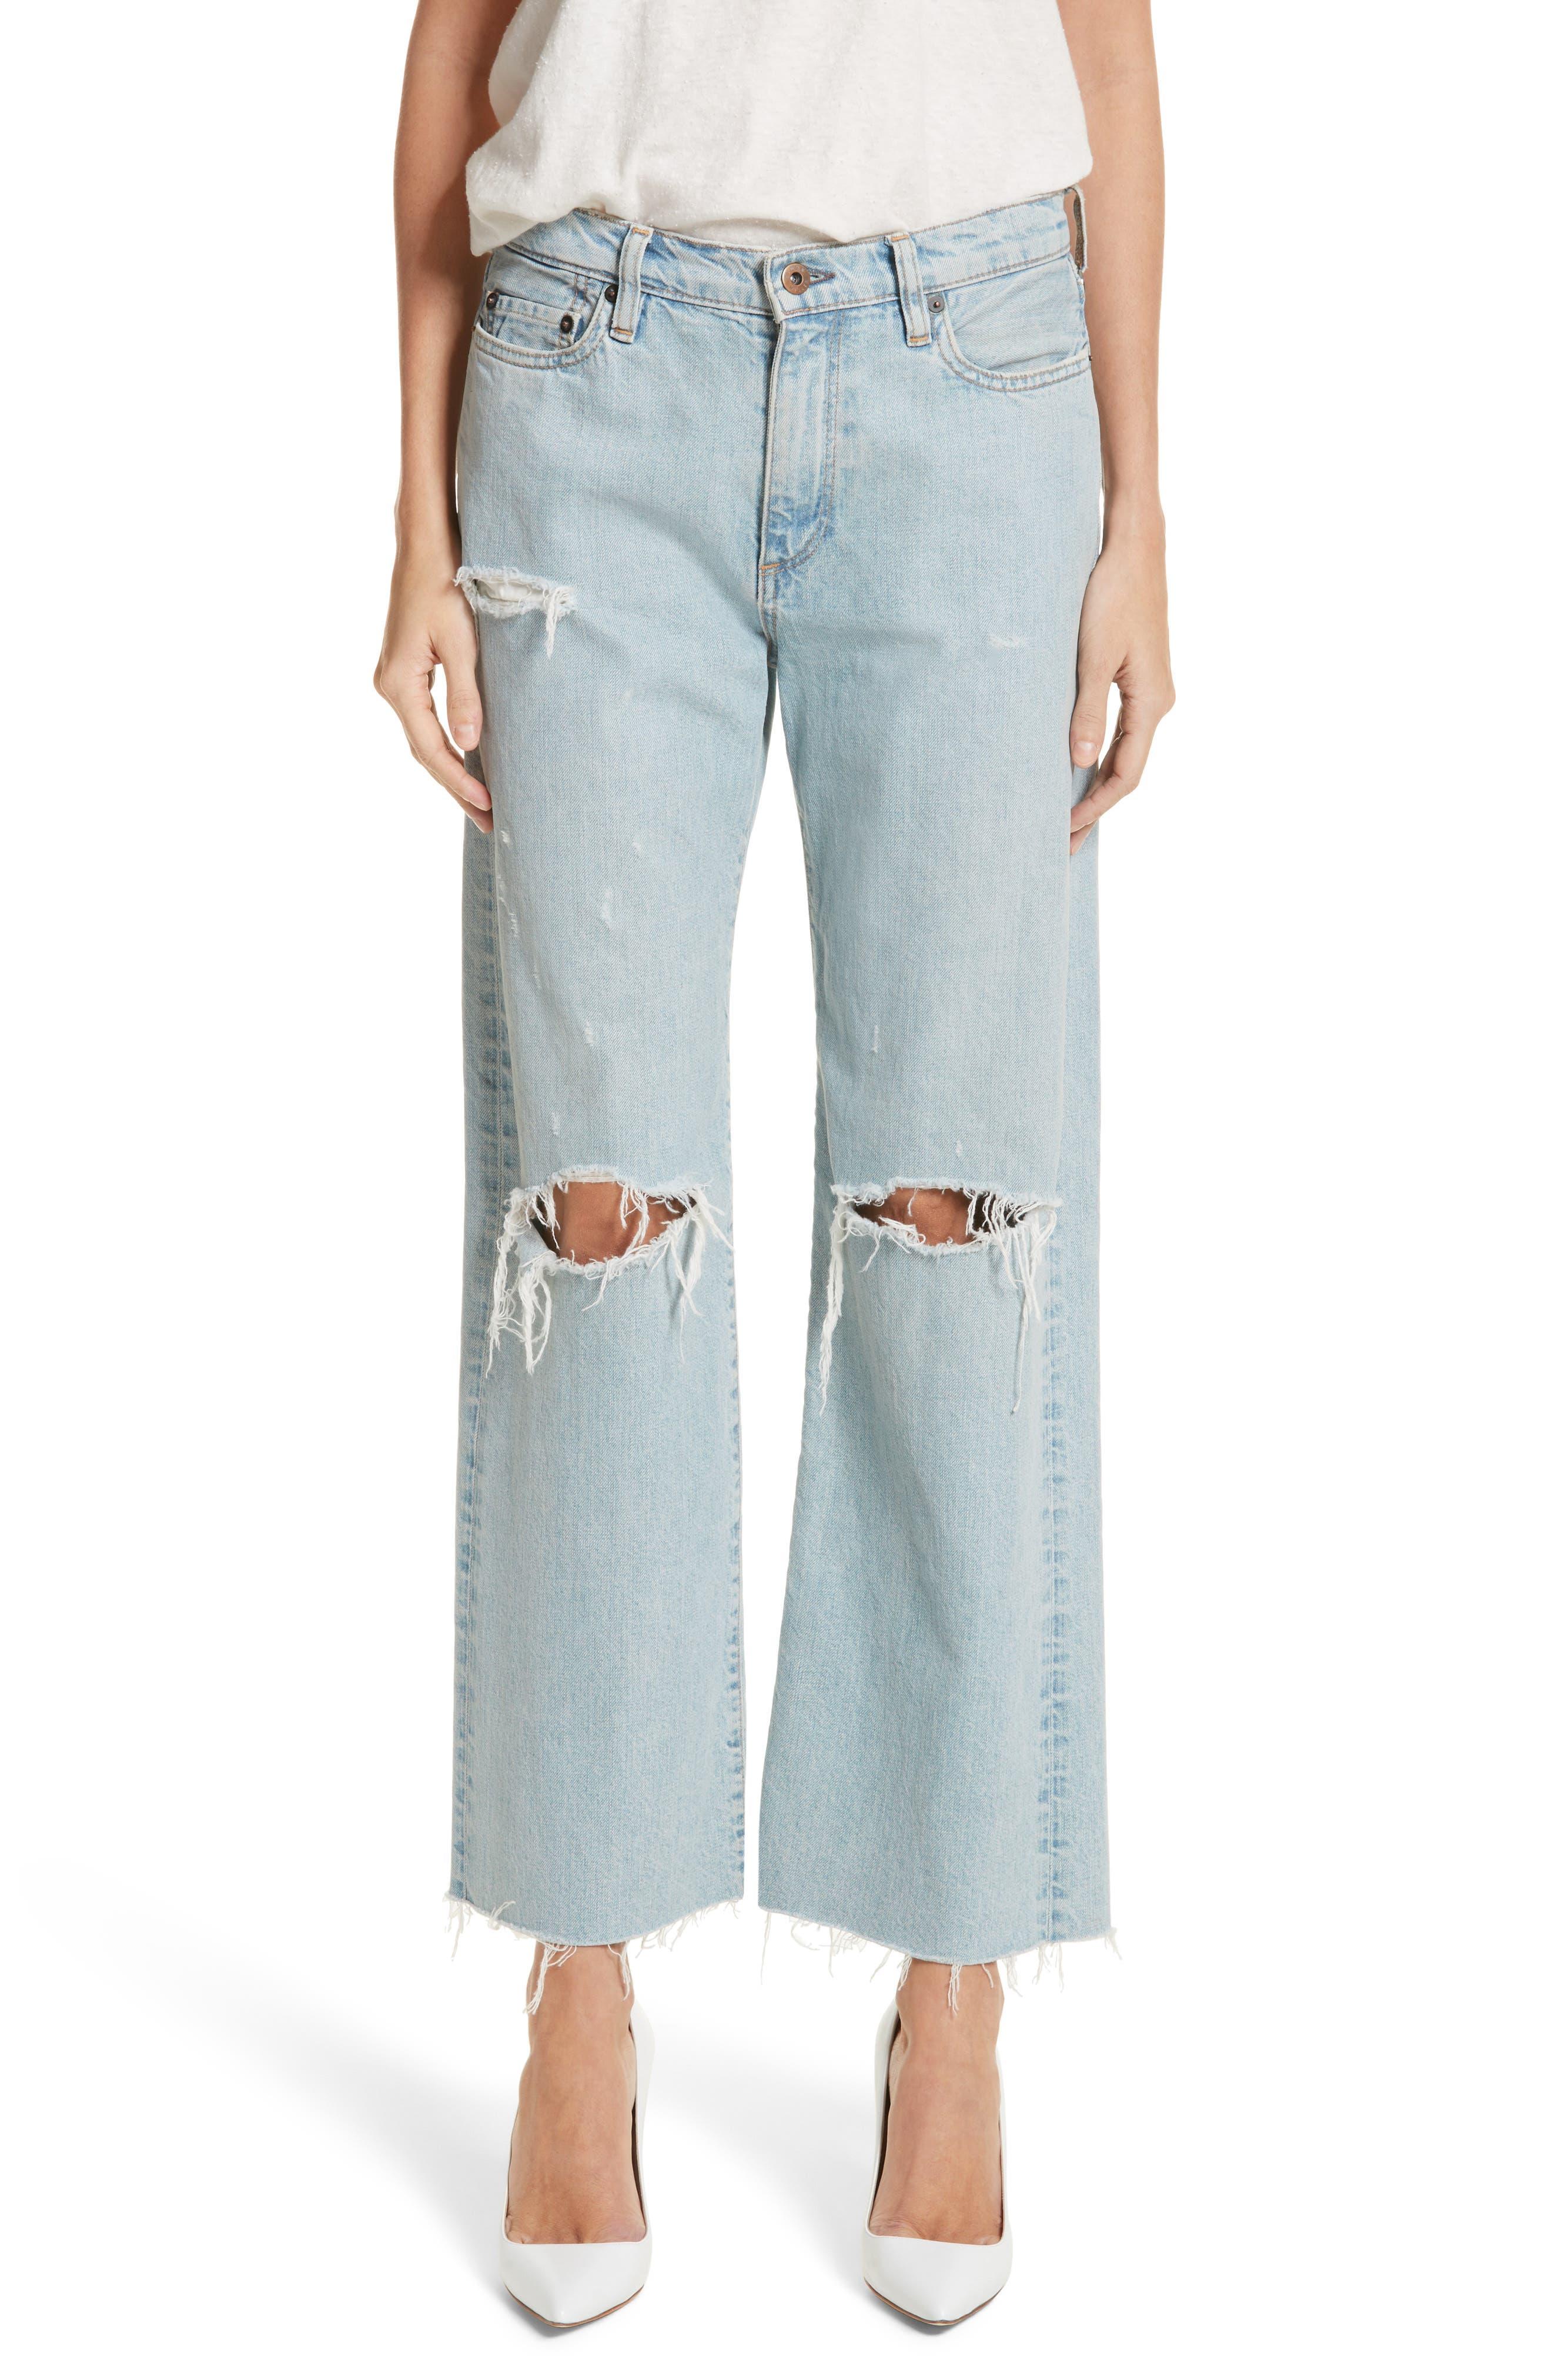 Tibbee Ripped Jeans,                             Main thumbnail 1, color,                             Light Indigo